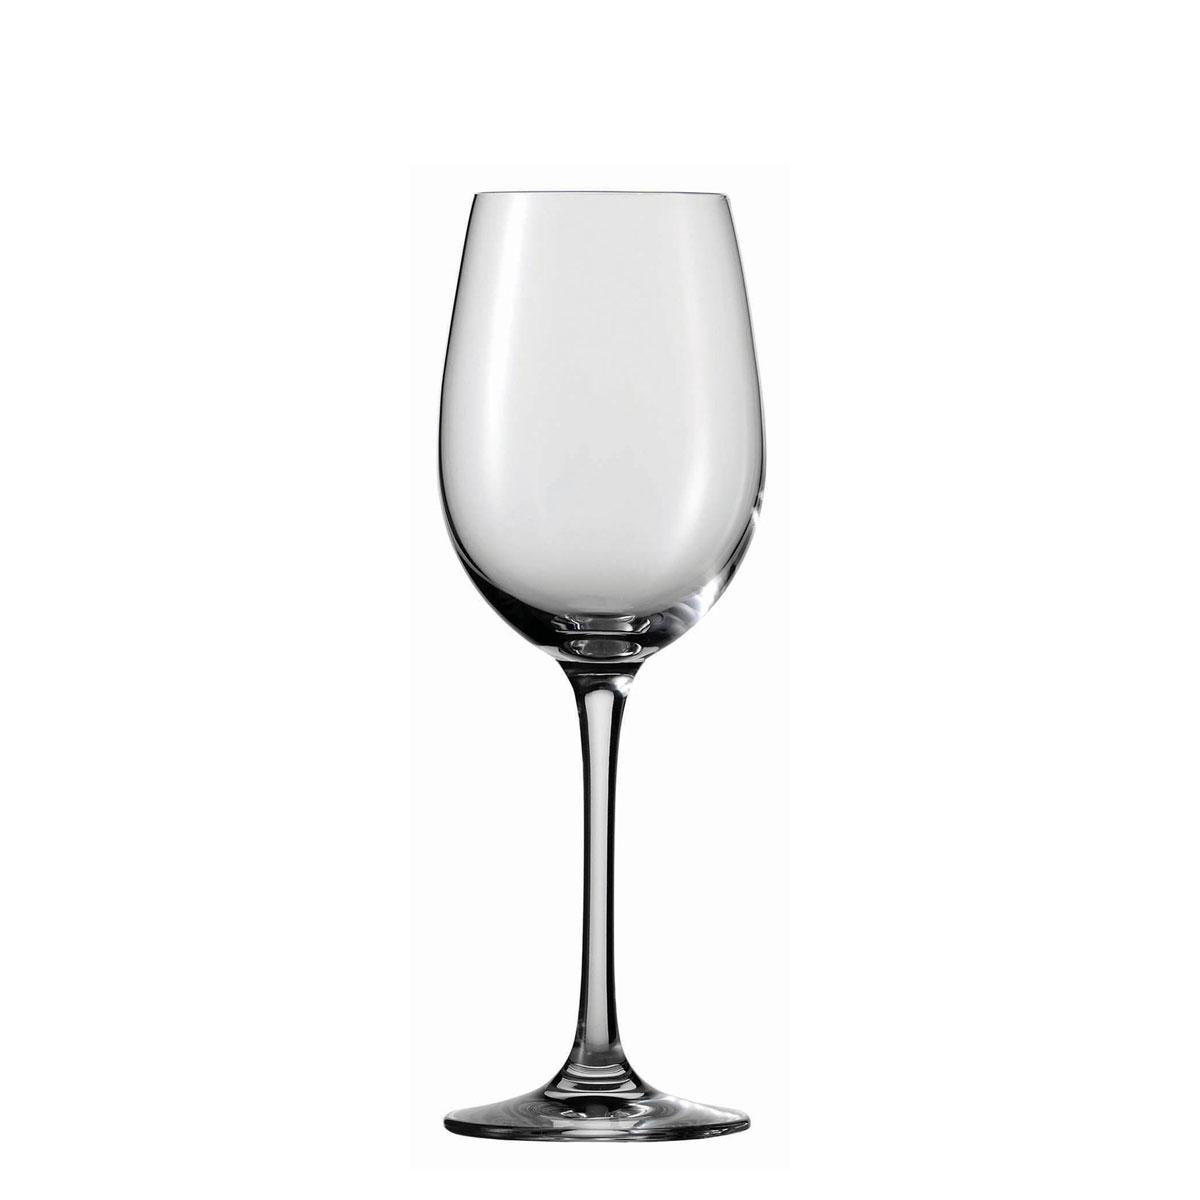 Schott Zwiesel Tritan Crystal, Classico All Purpose Crystal White Wine #2, Single